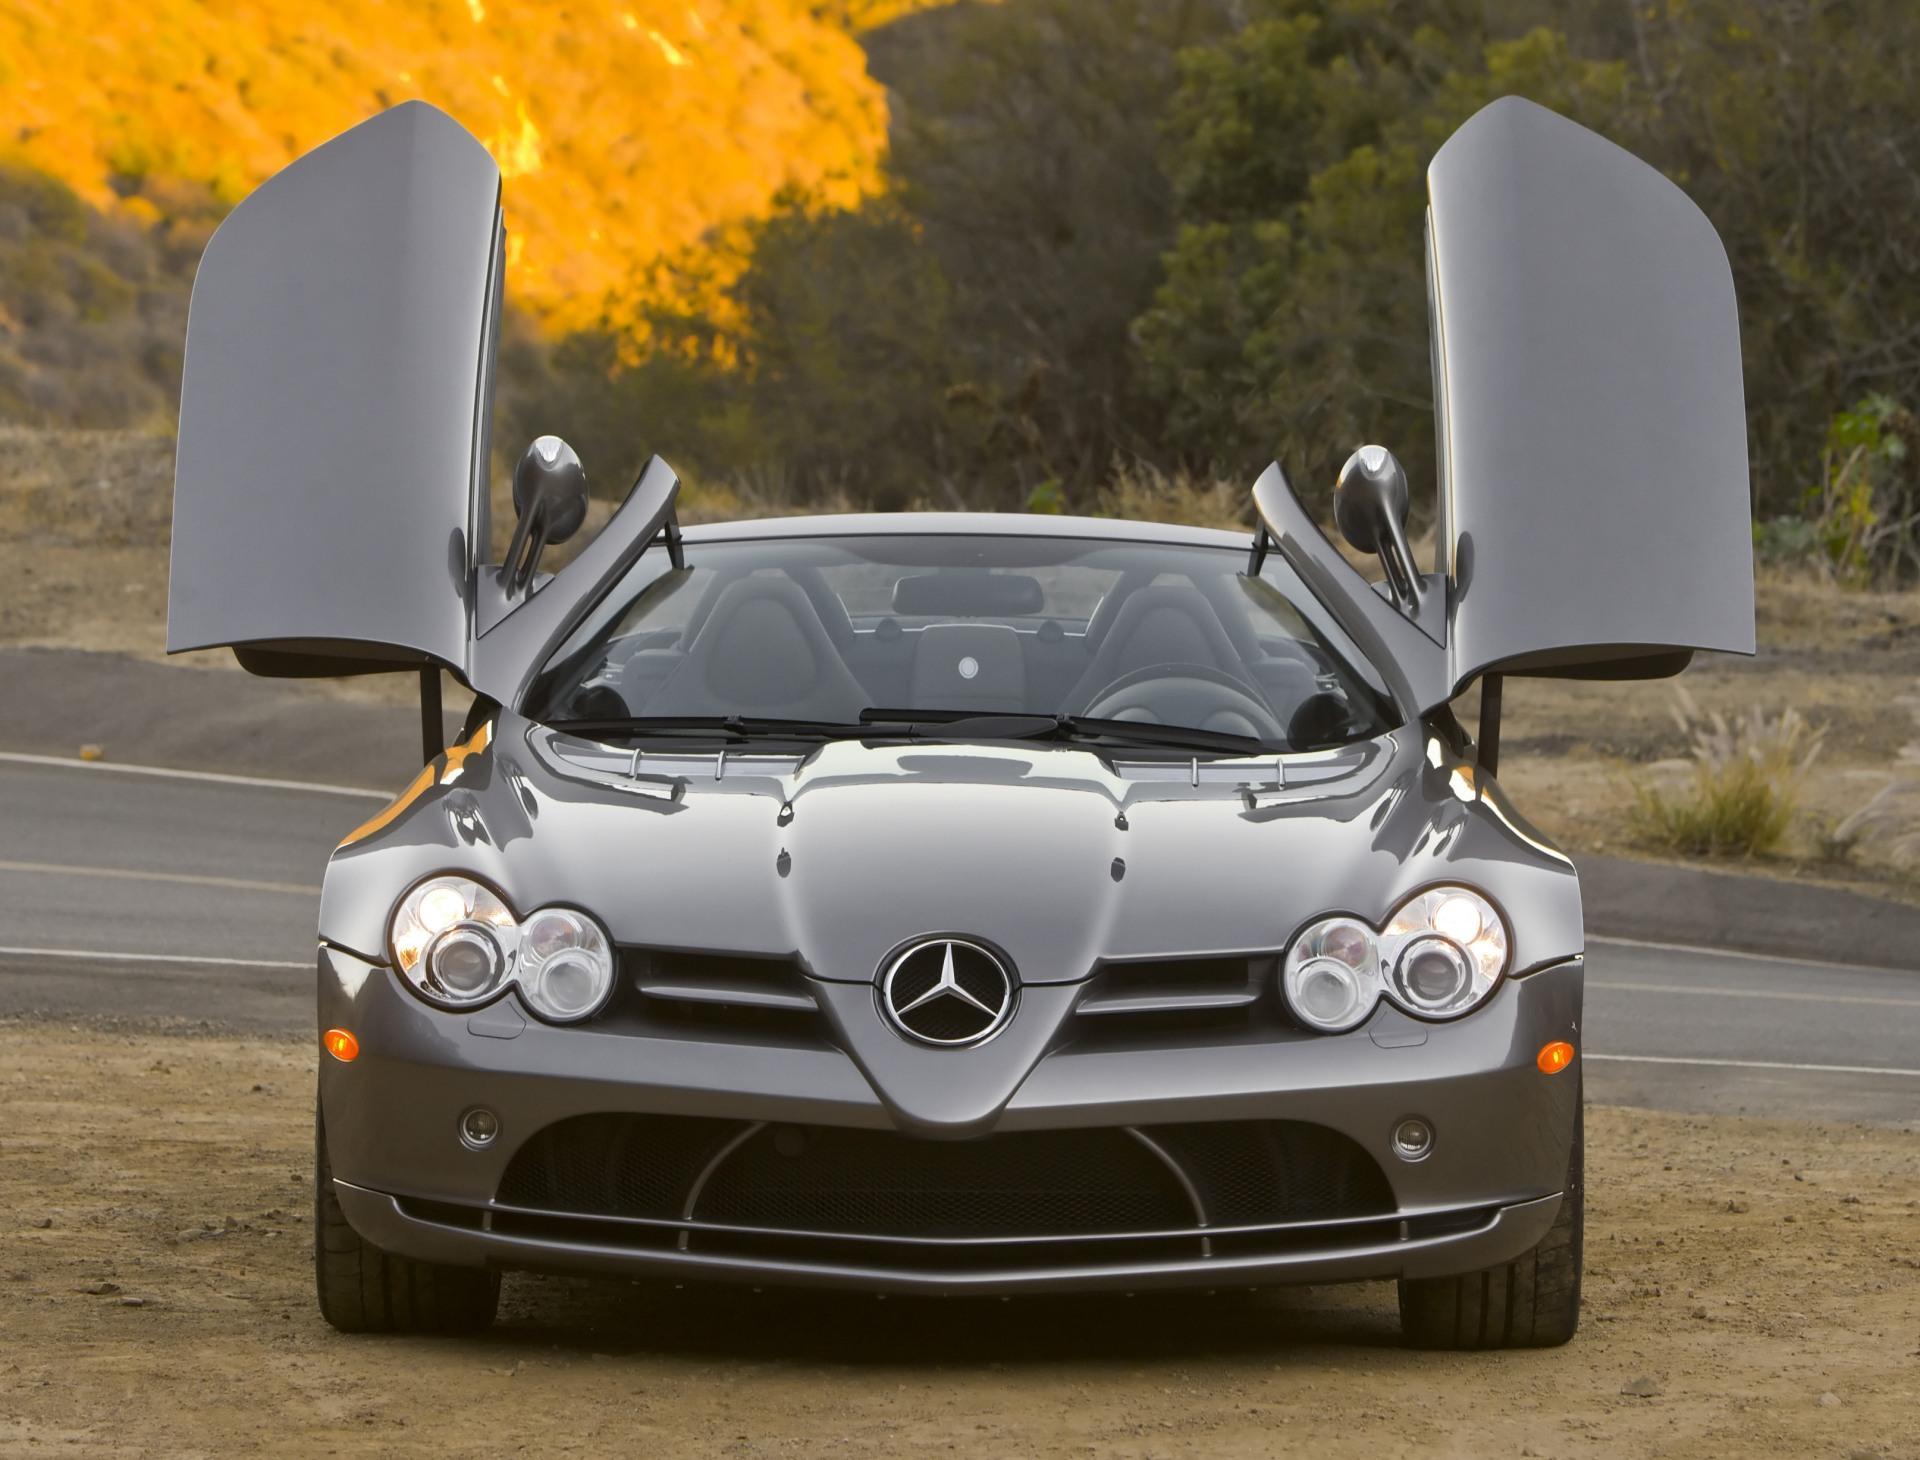 Slr roadster 2008 open doors wallpaper mercedes cars 74 for Mercedes benz best cars